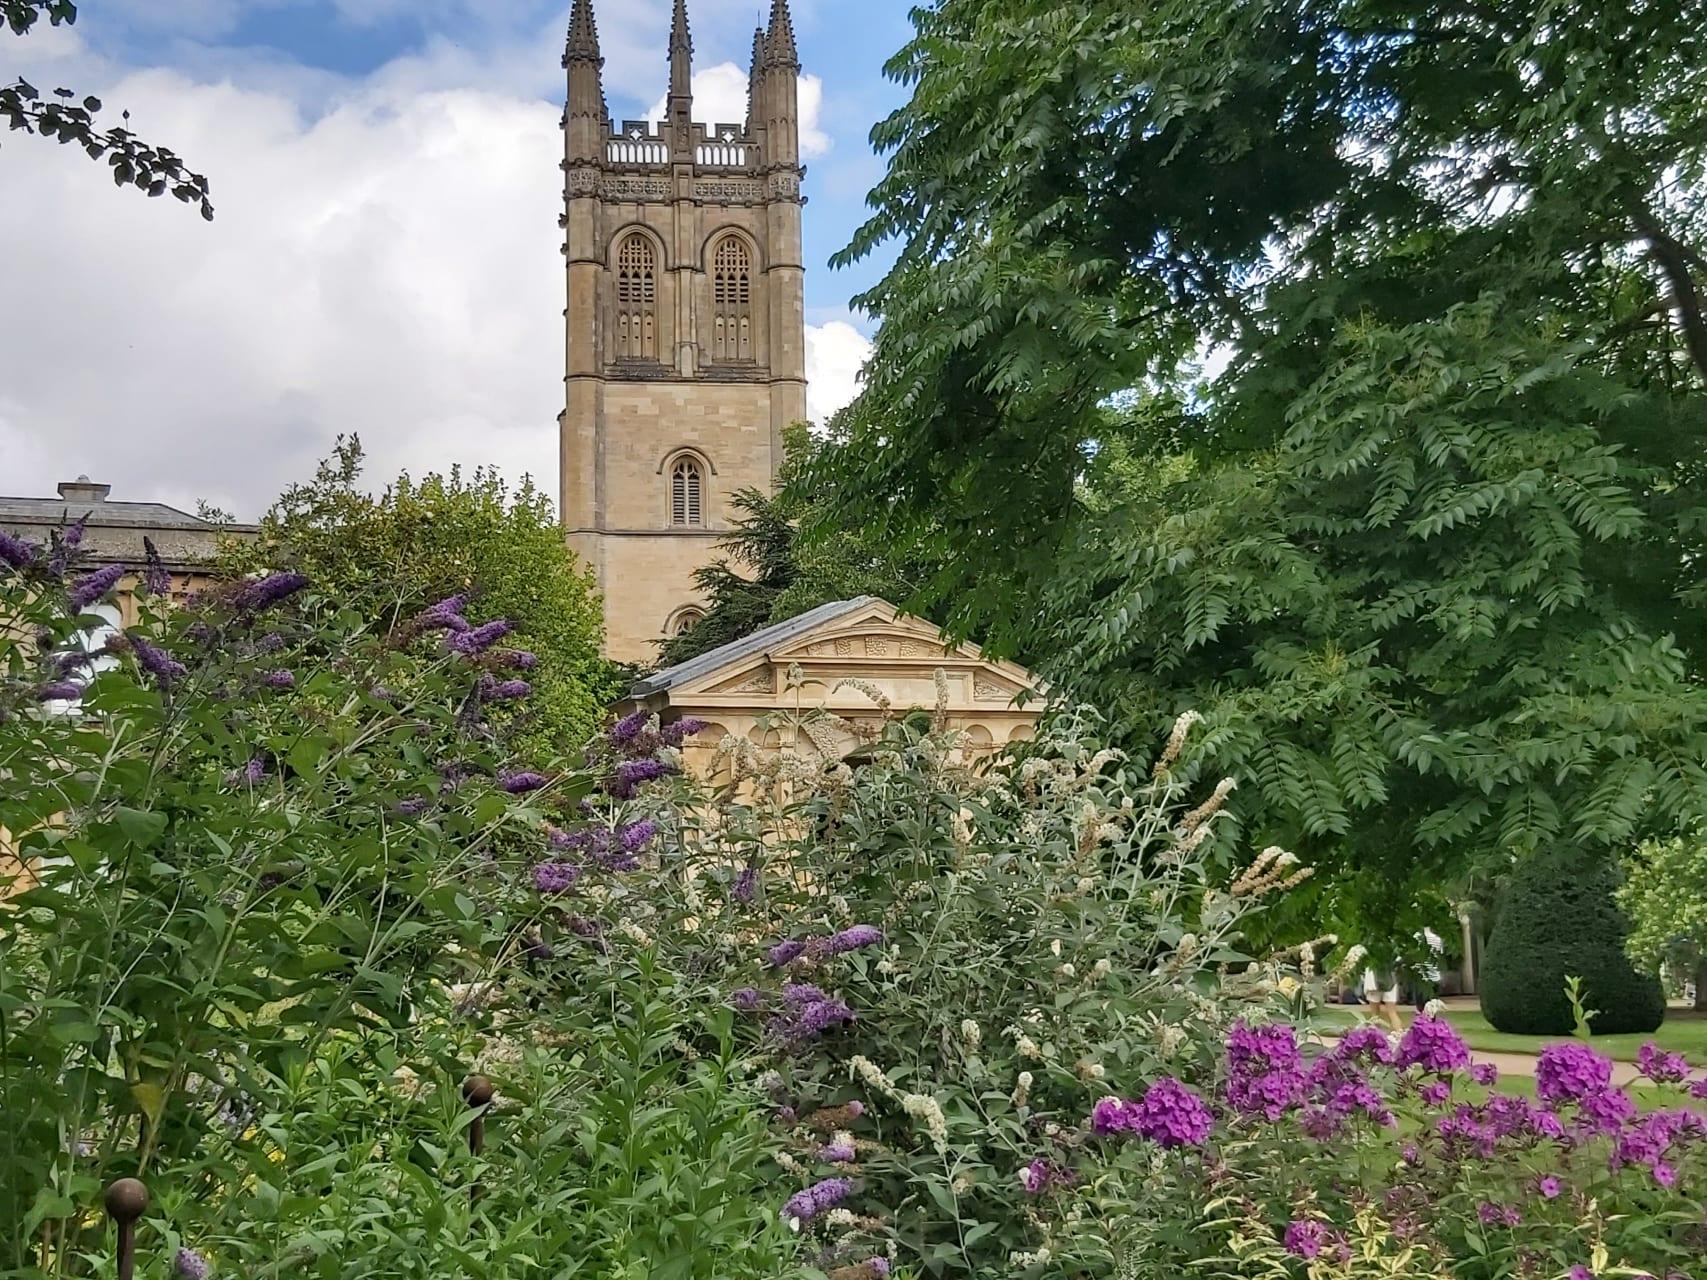 Oxford - Oxford Botanic Garden - An Oasis in the City